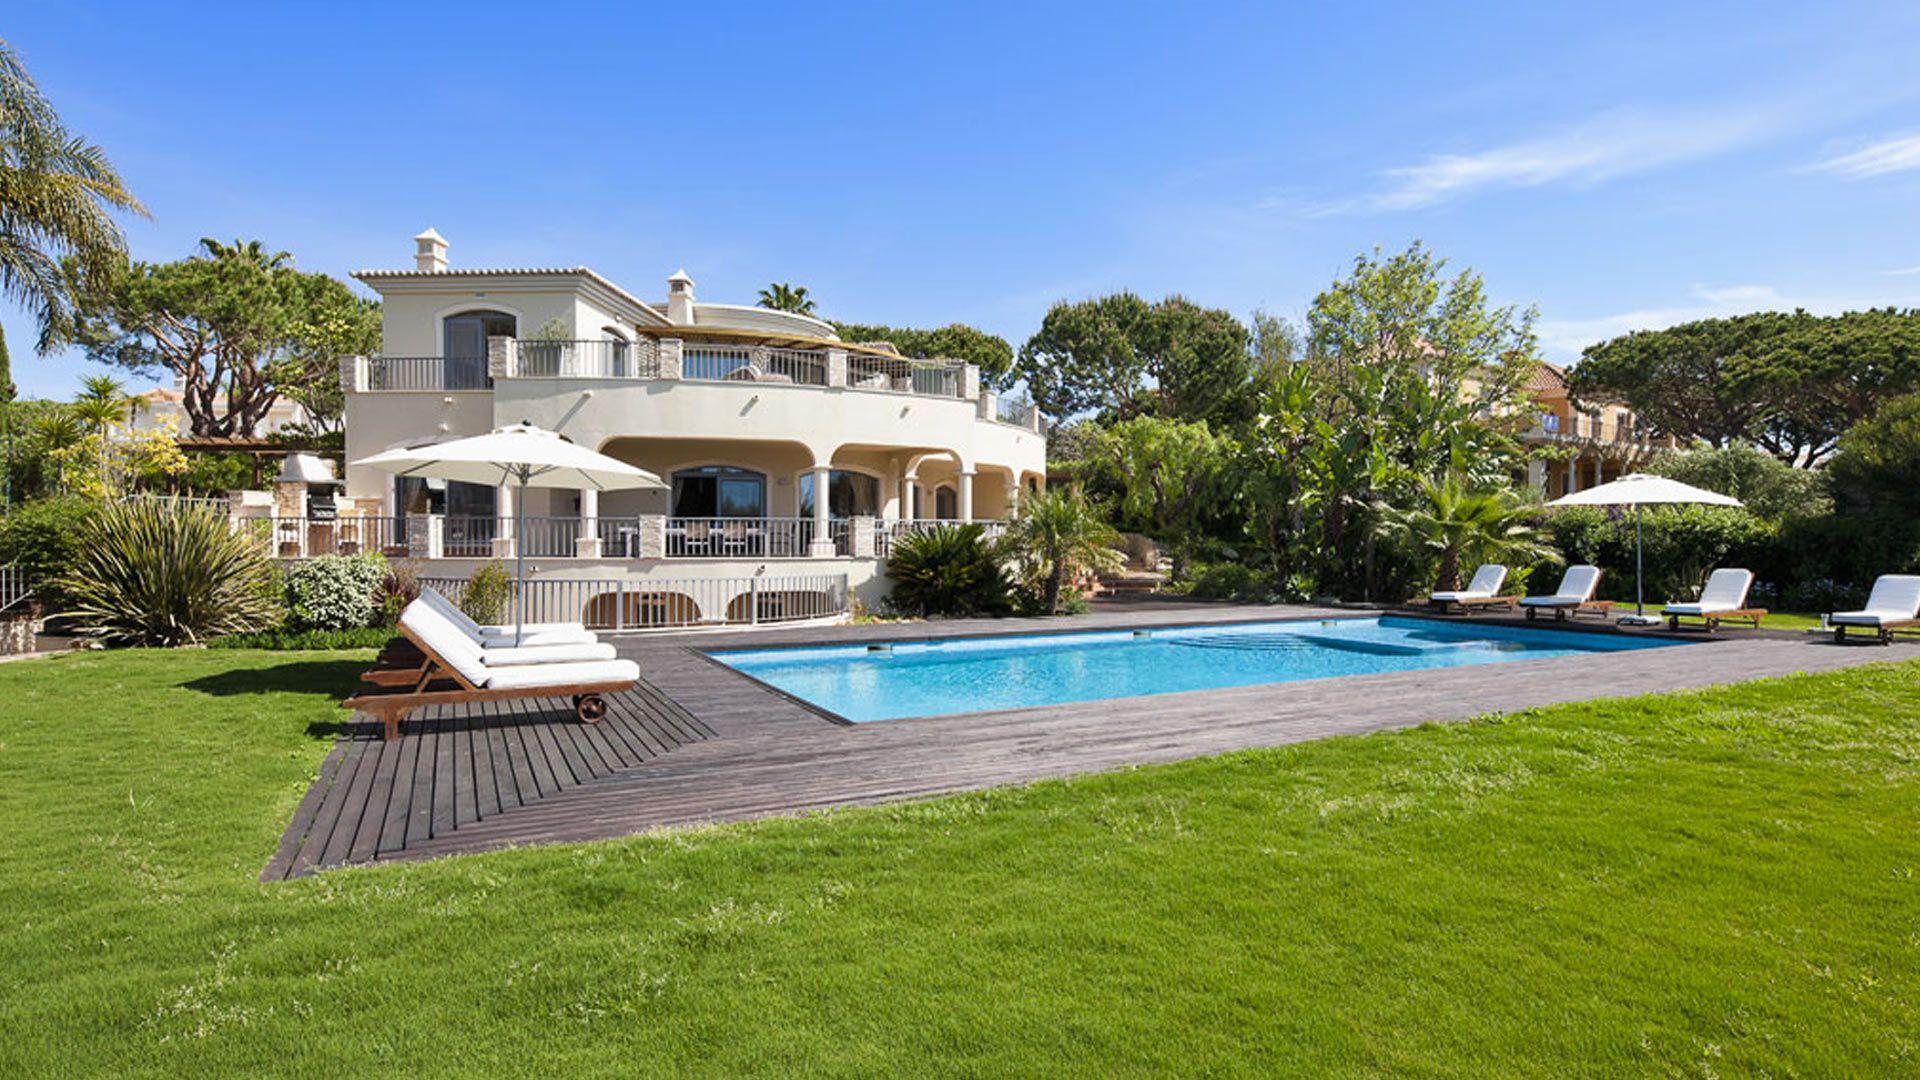 Private Villas In Portugal villa wood spirit - algarve splendid 6 bedrooms villa, 6